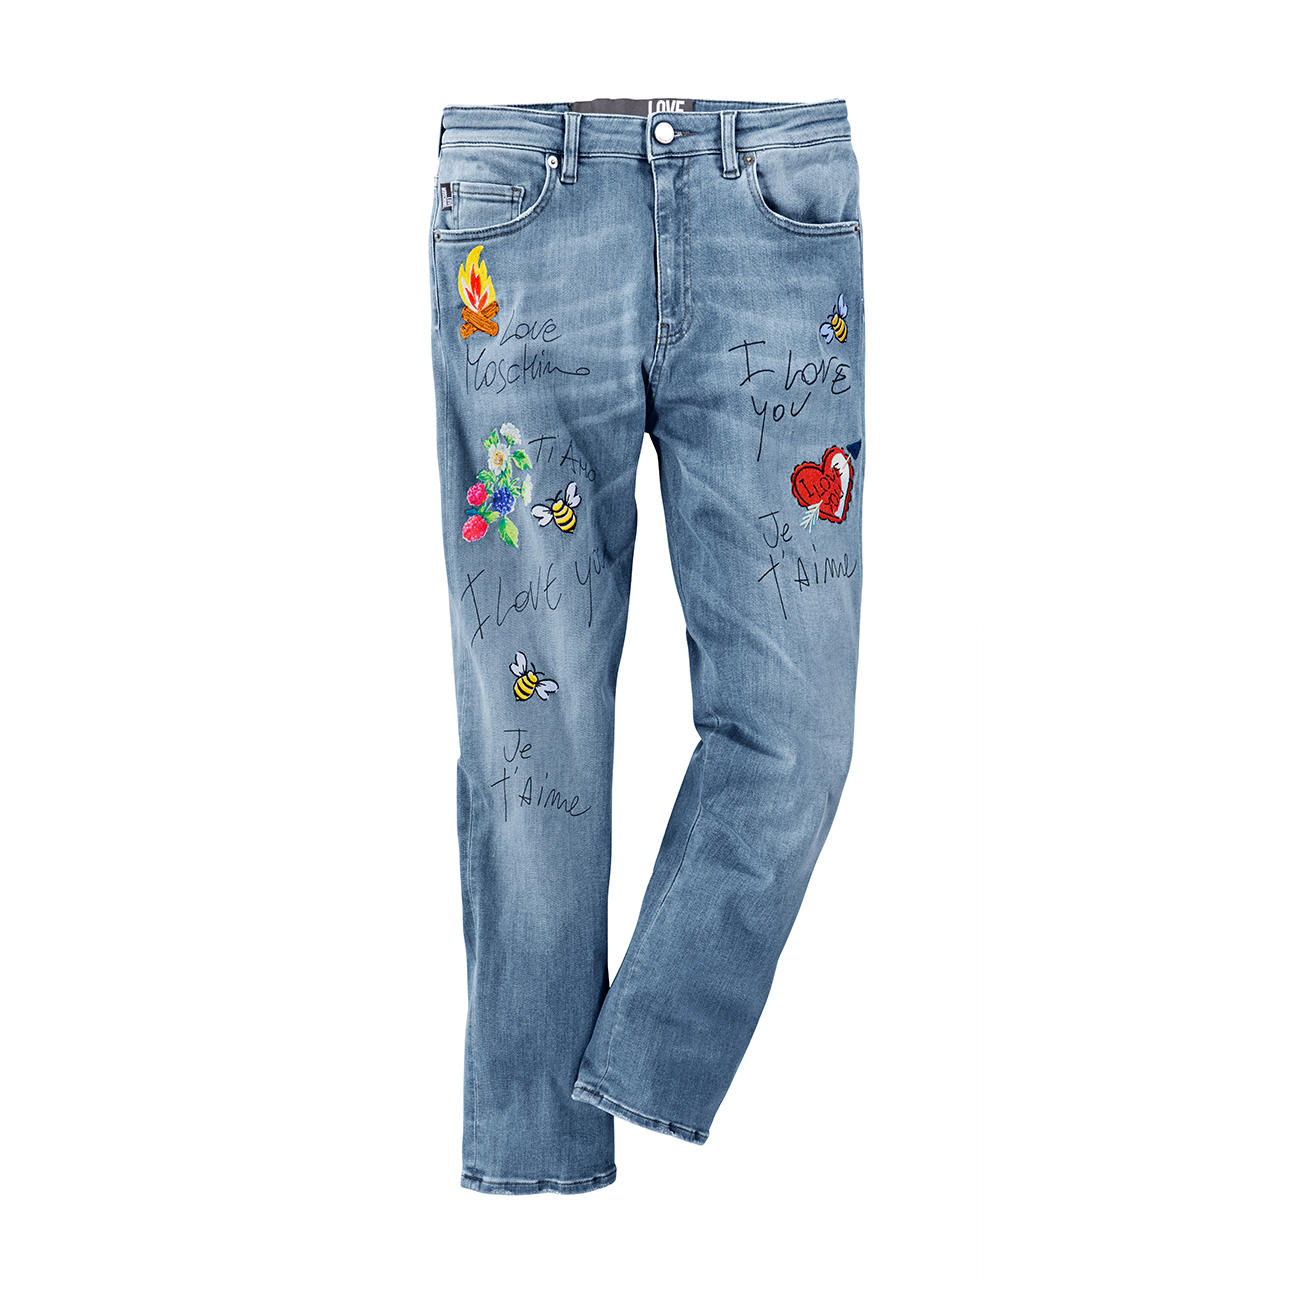 love moschino patch jeans 3 jahre garantie pro idee. Black Bedroom Furniture Sets. Home Design Ideas